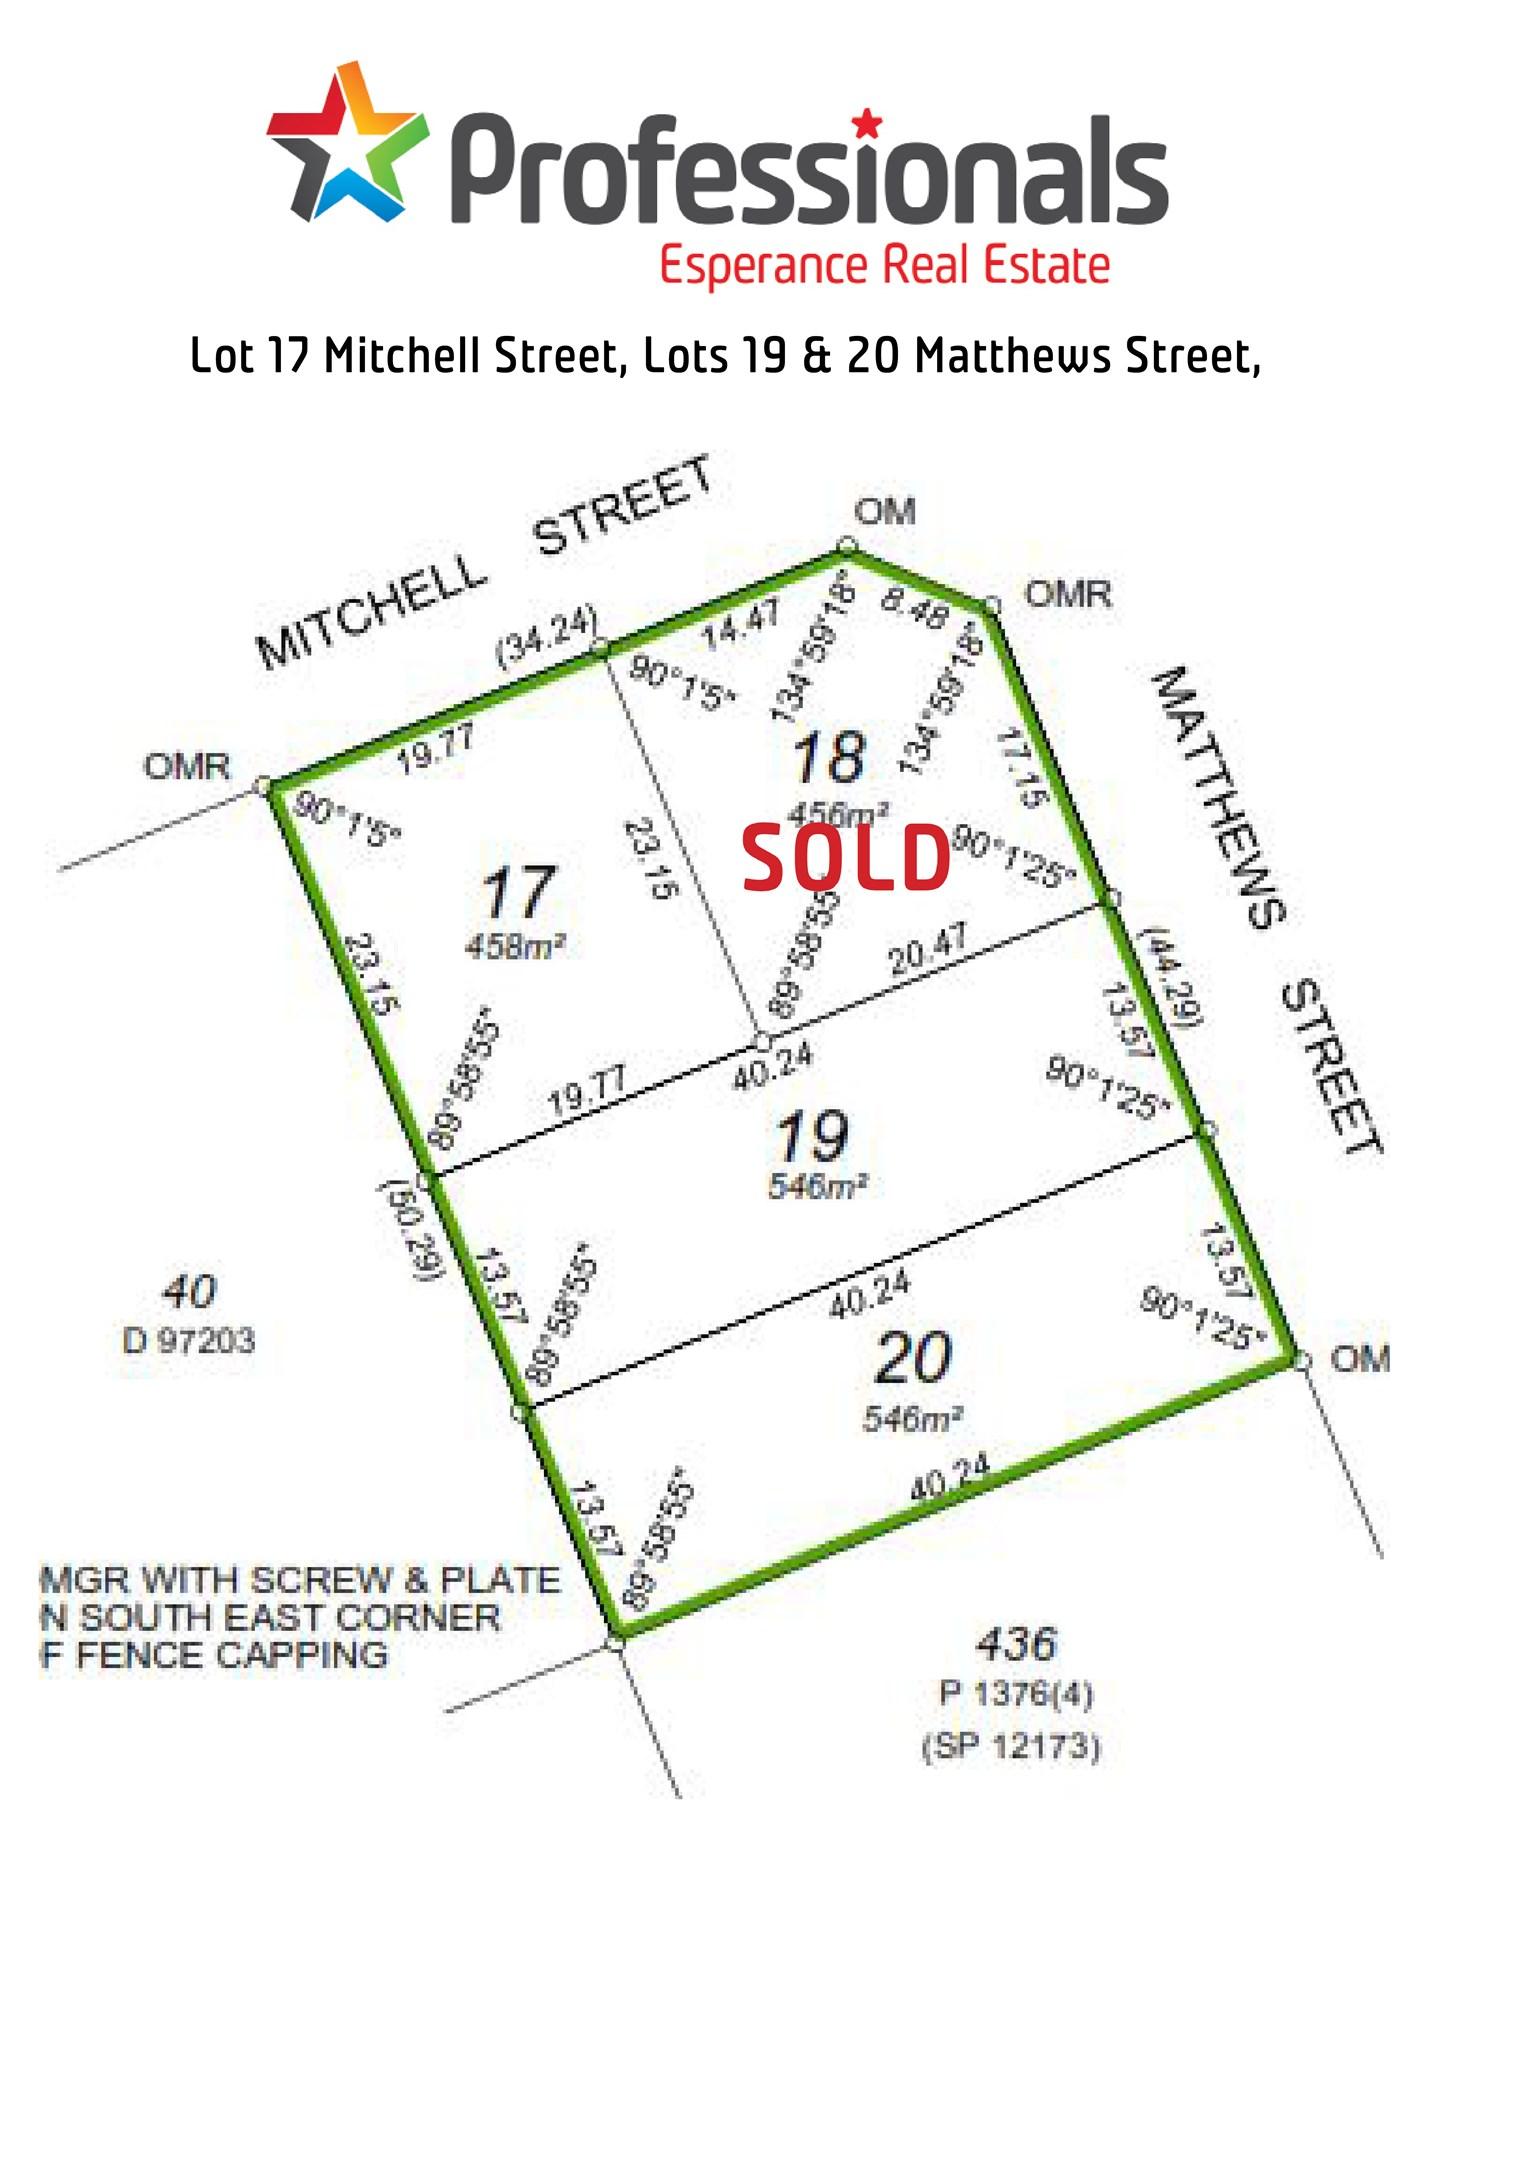 Lot 19 Matthews Street, Castletown